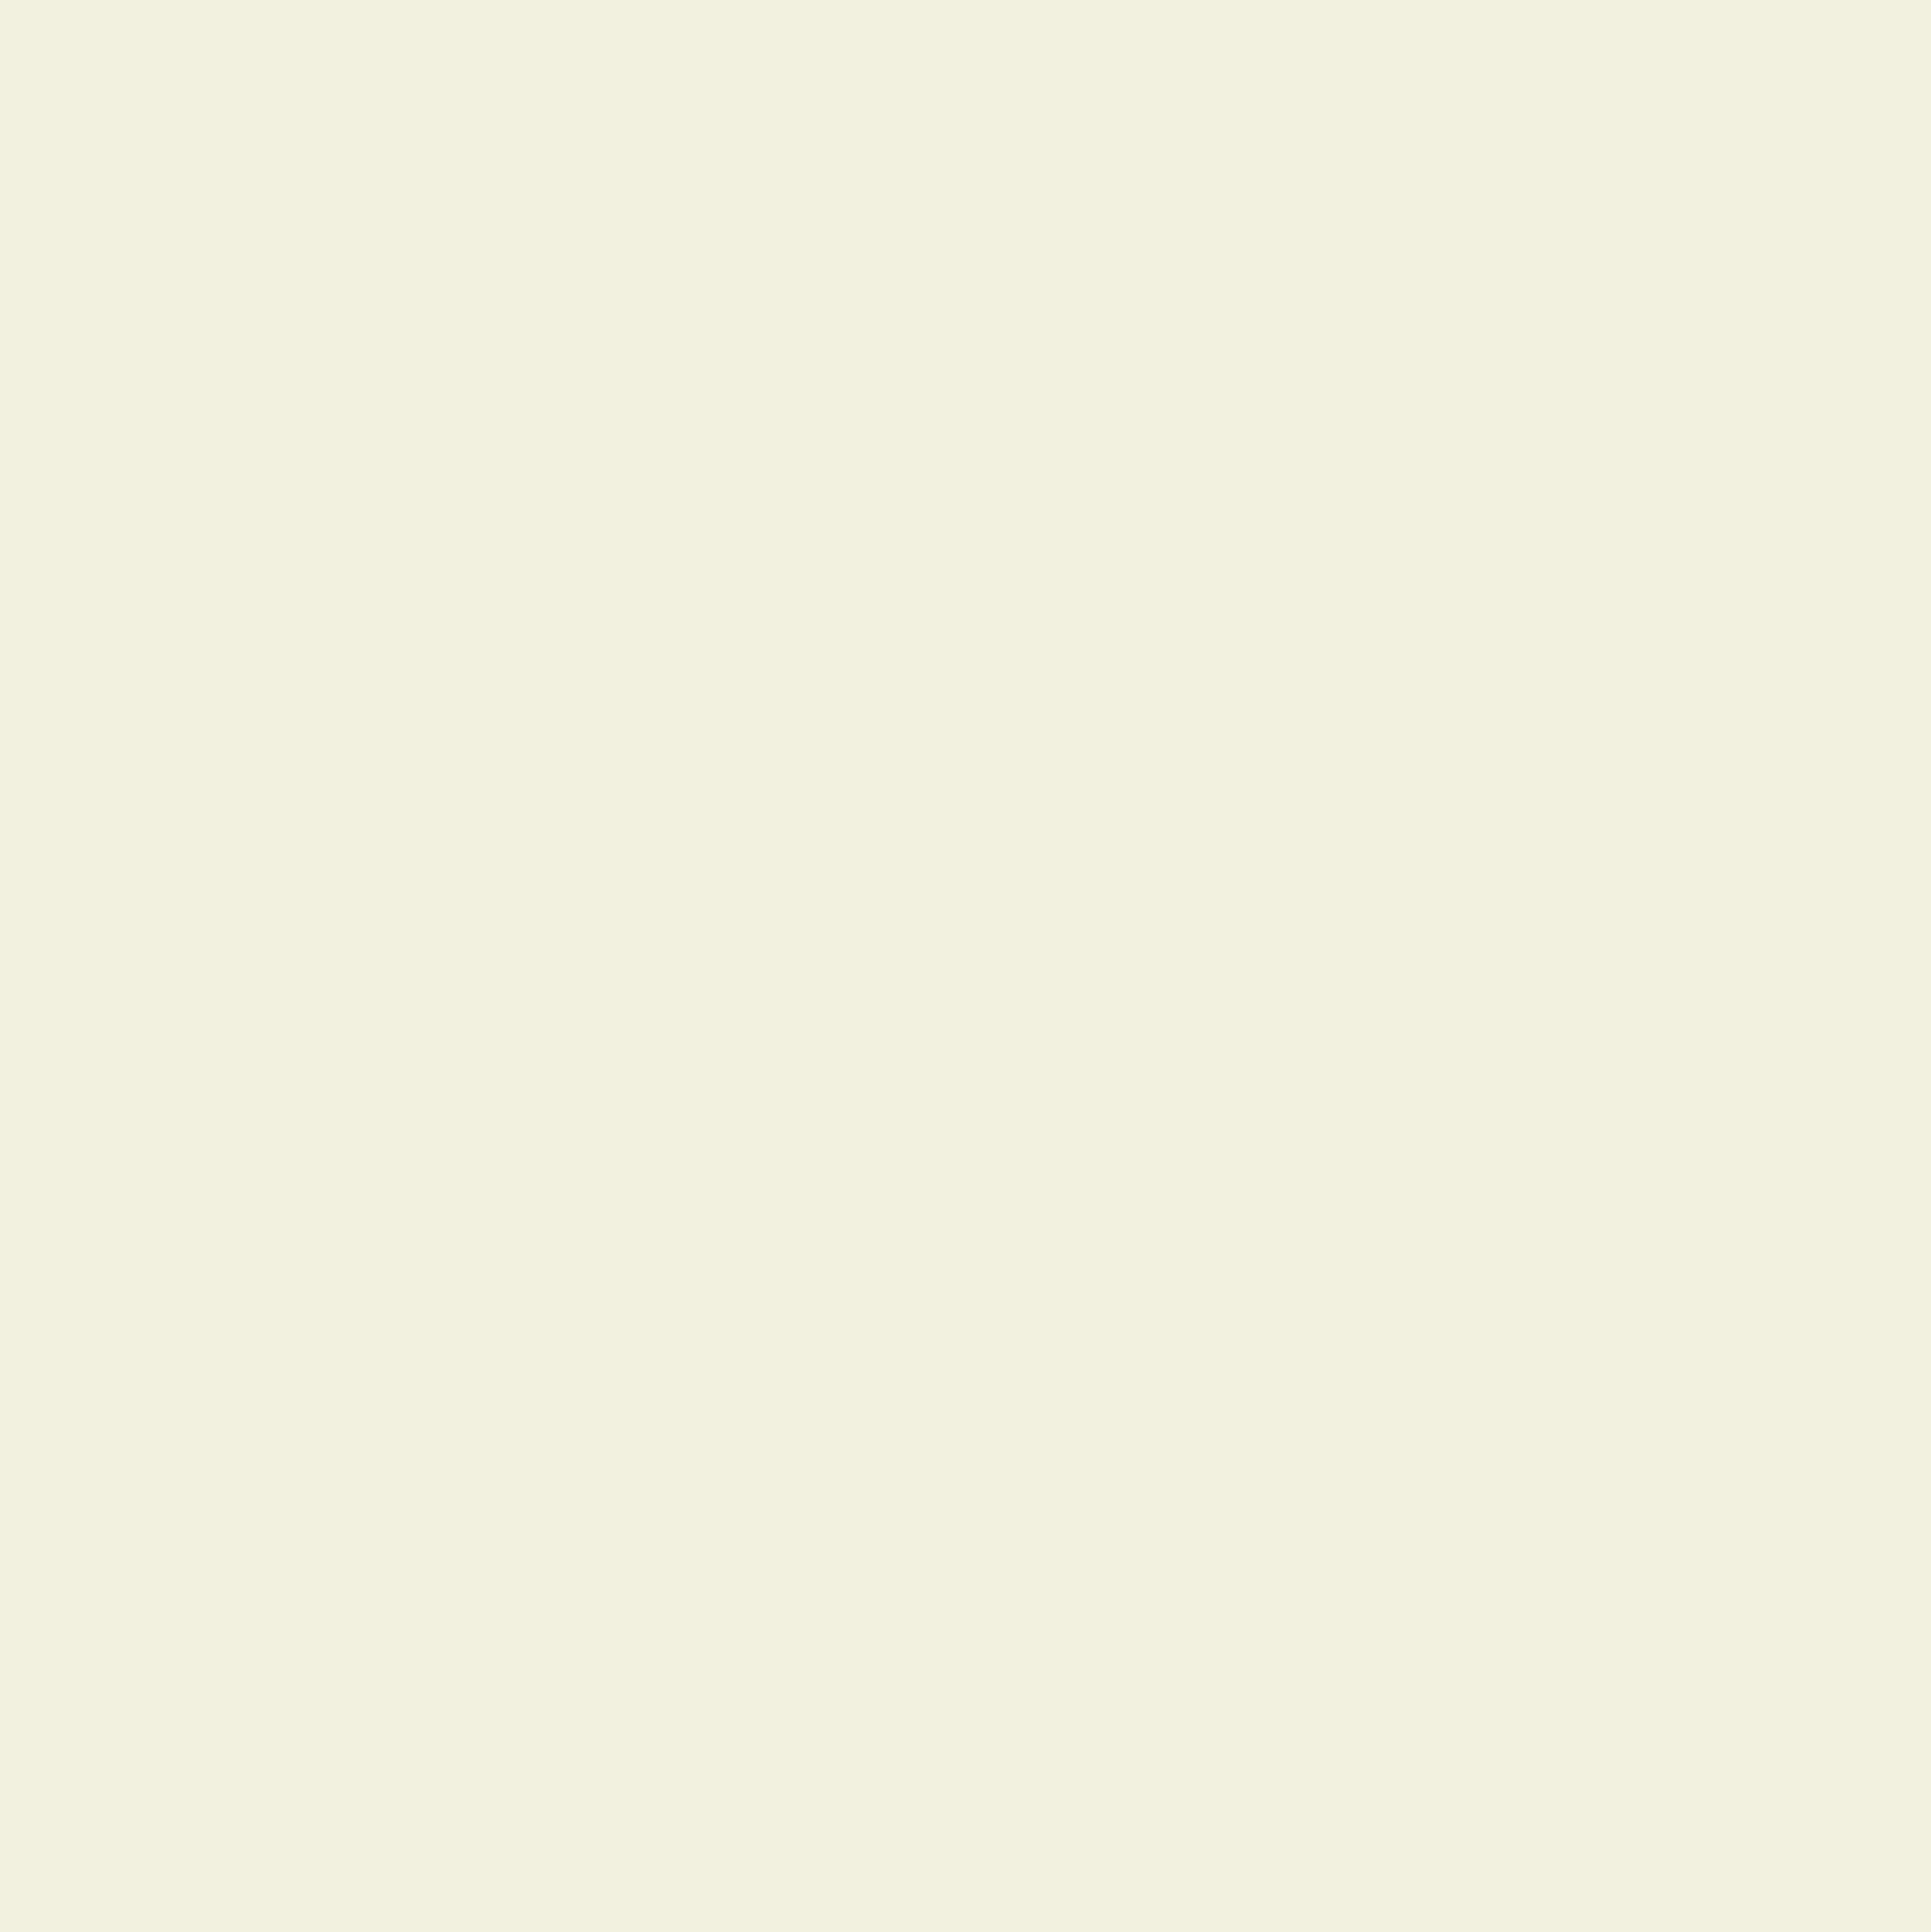 Mantel CRUDOColorLiso Rectangular 1,8x2,7m [enstockpara envíooretiro]